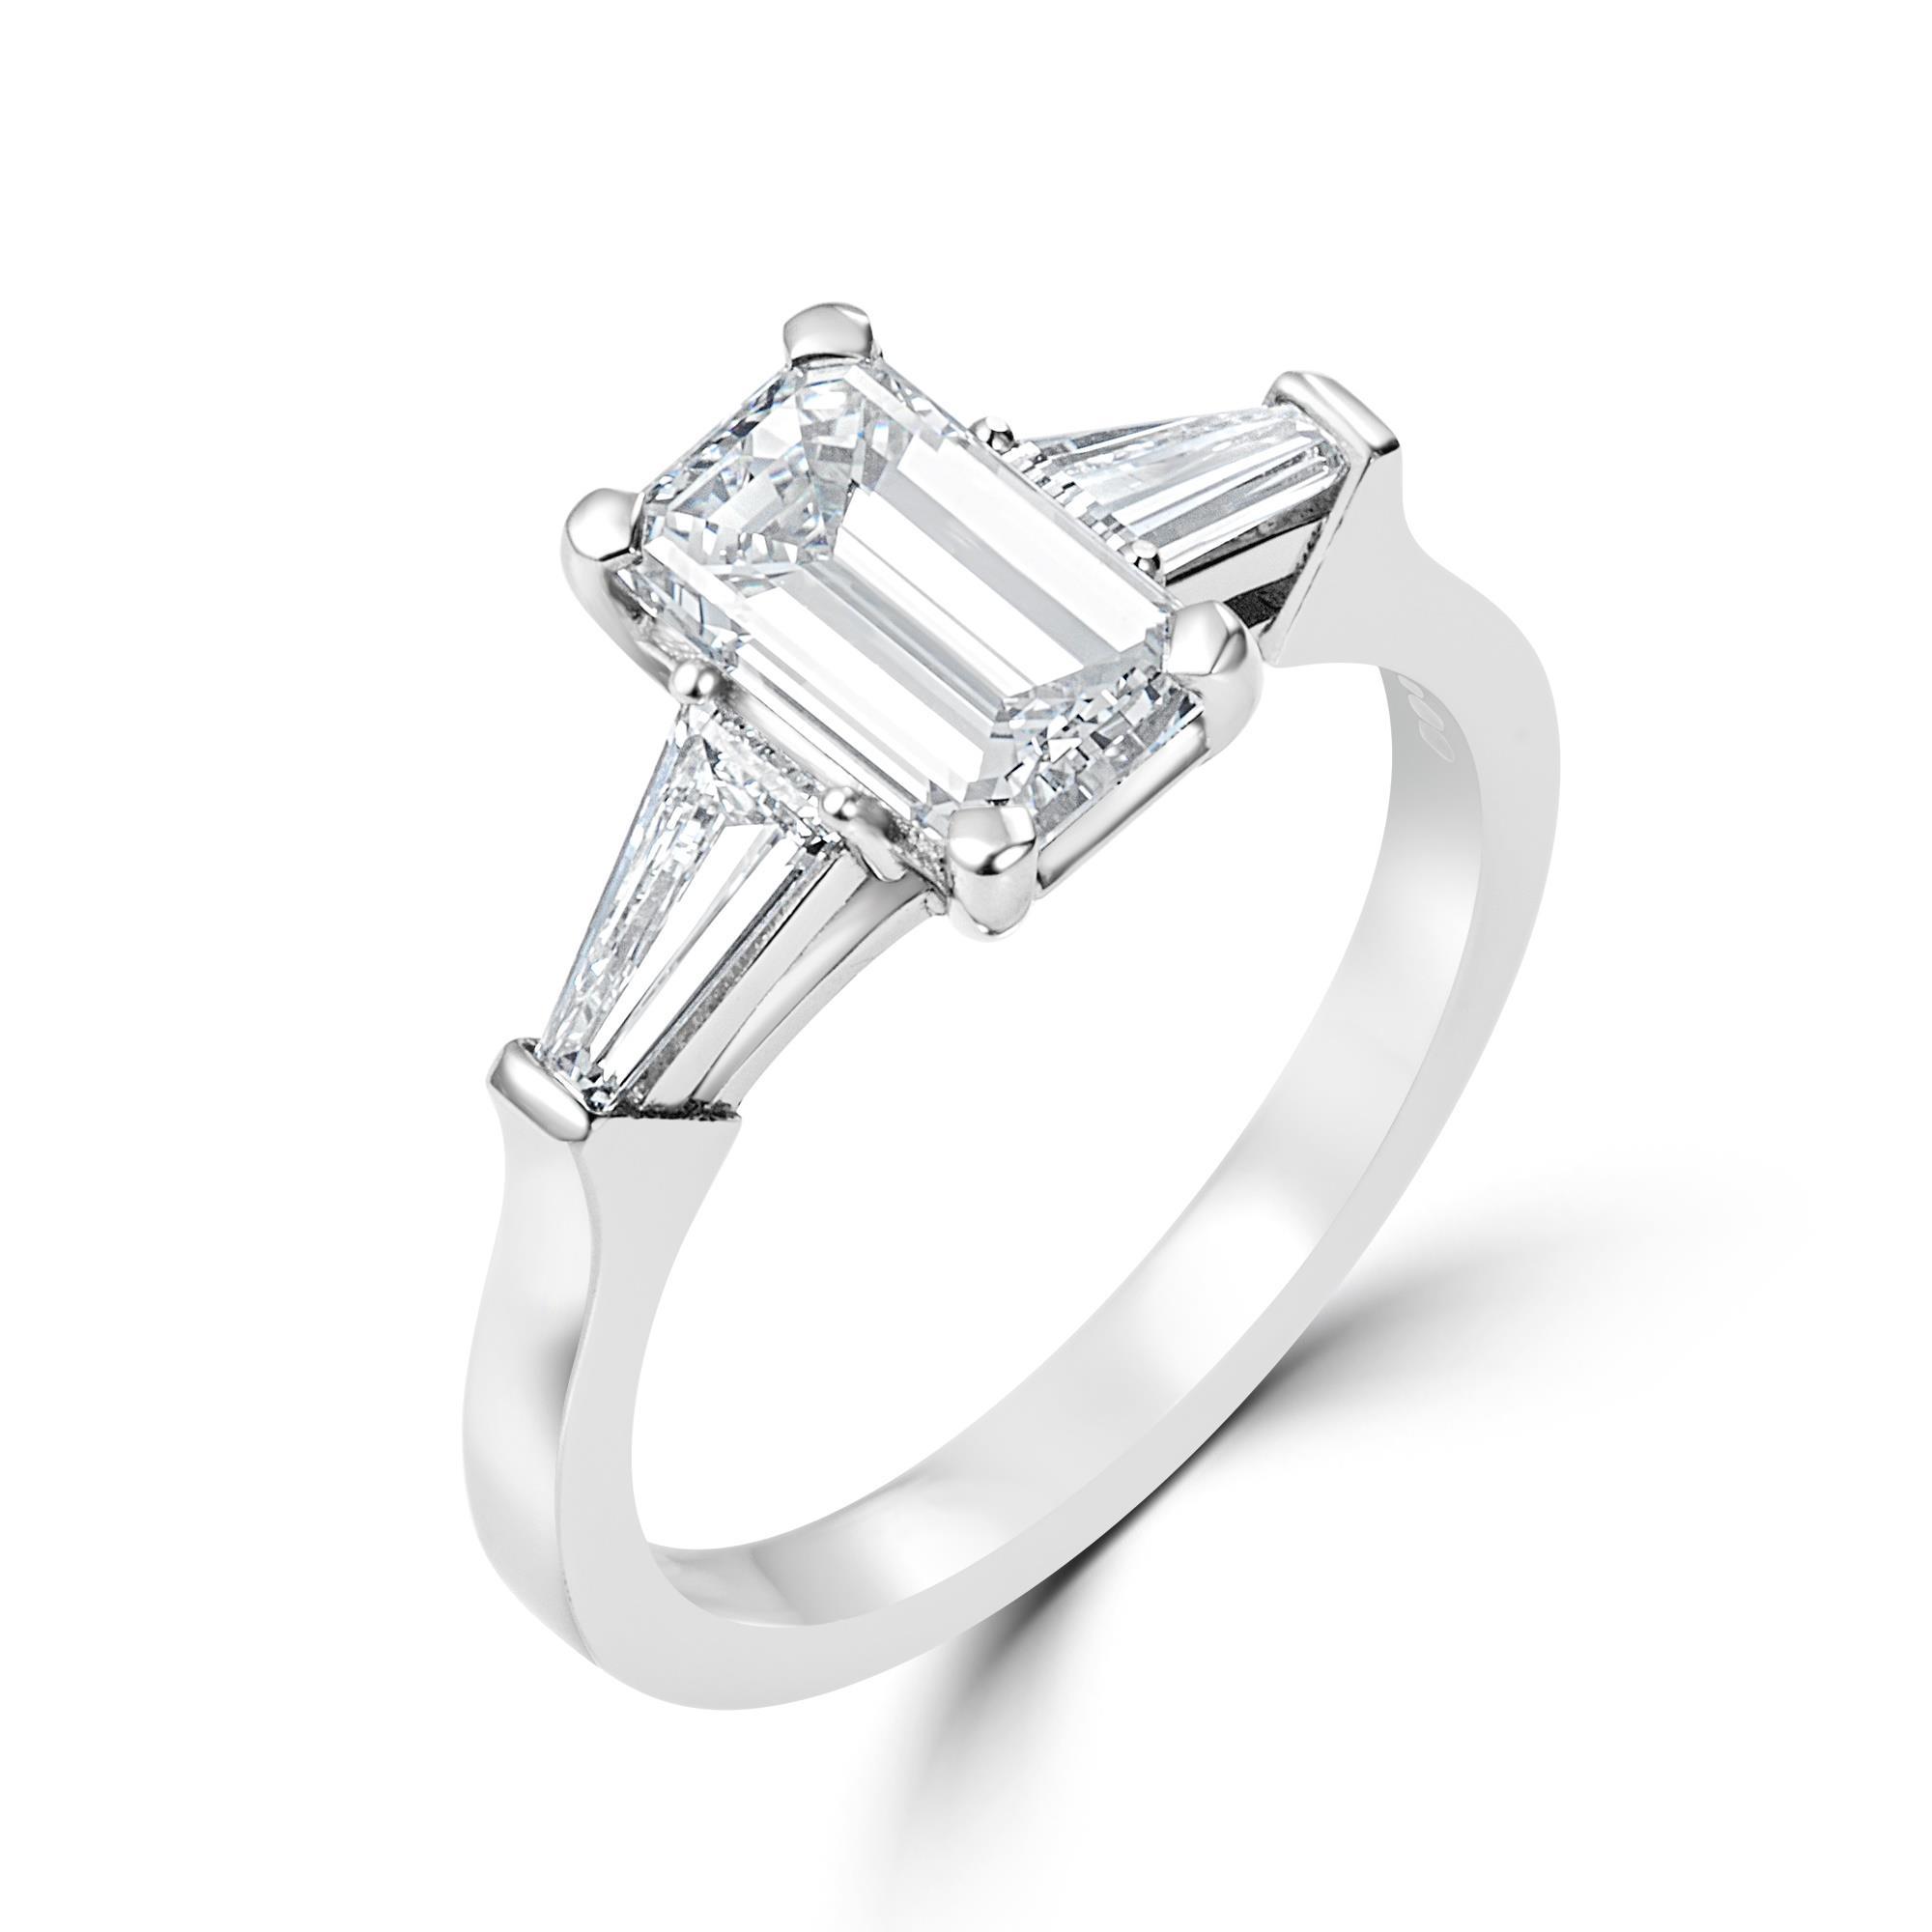 Platinum Emerald Cut And Baguette Diamond Three Stone Ring Pravins